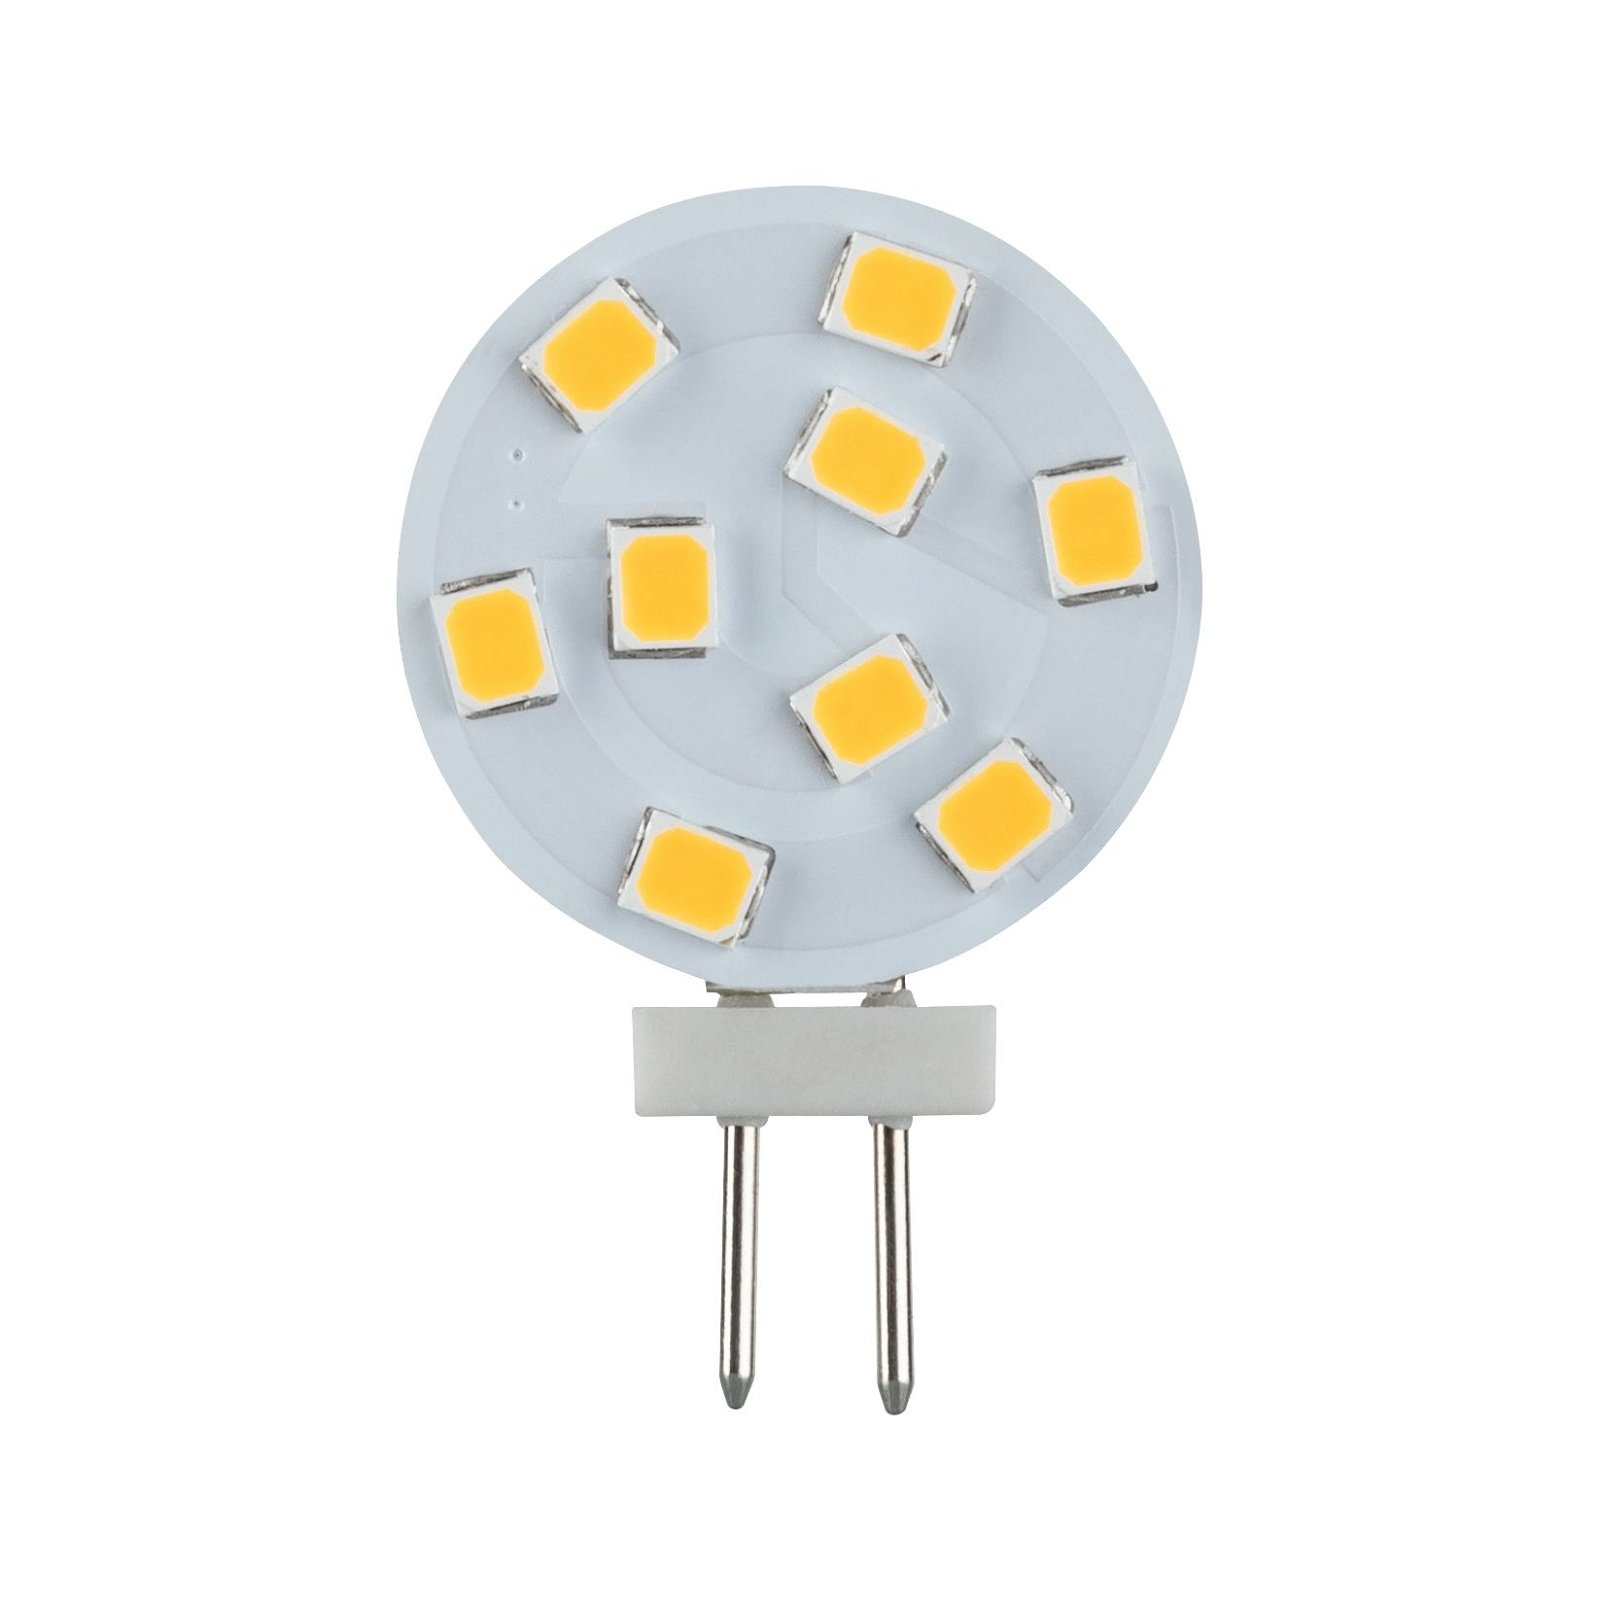 LED Stiftsockel G4 12V 250lm 2,5W 2700K Weiß